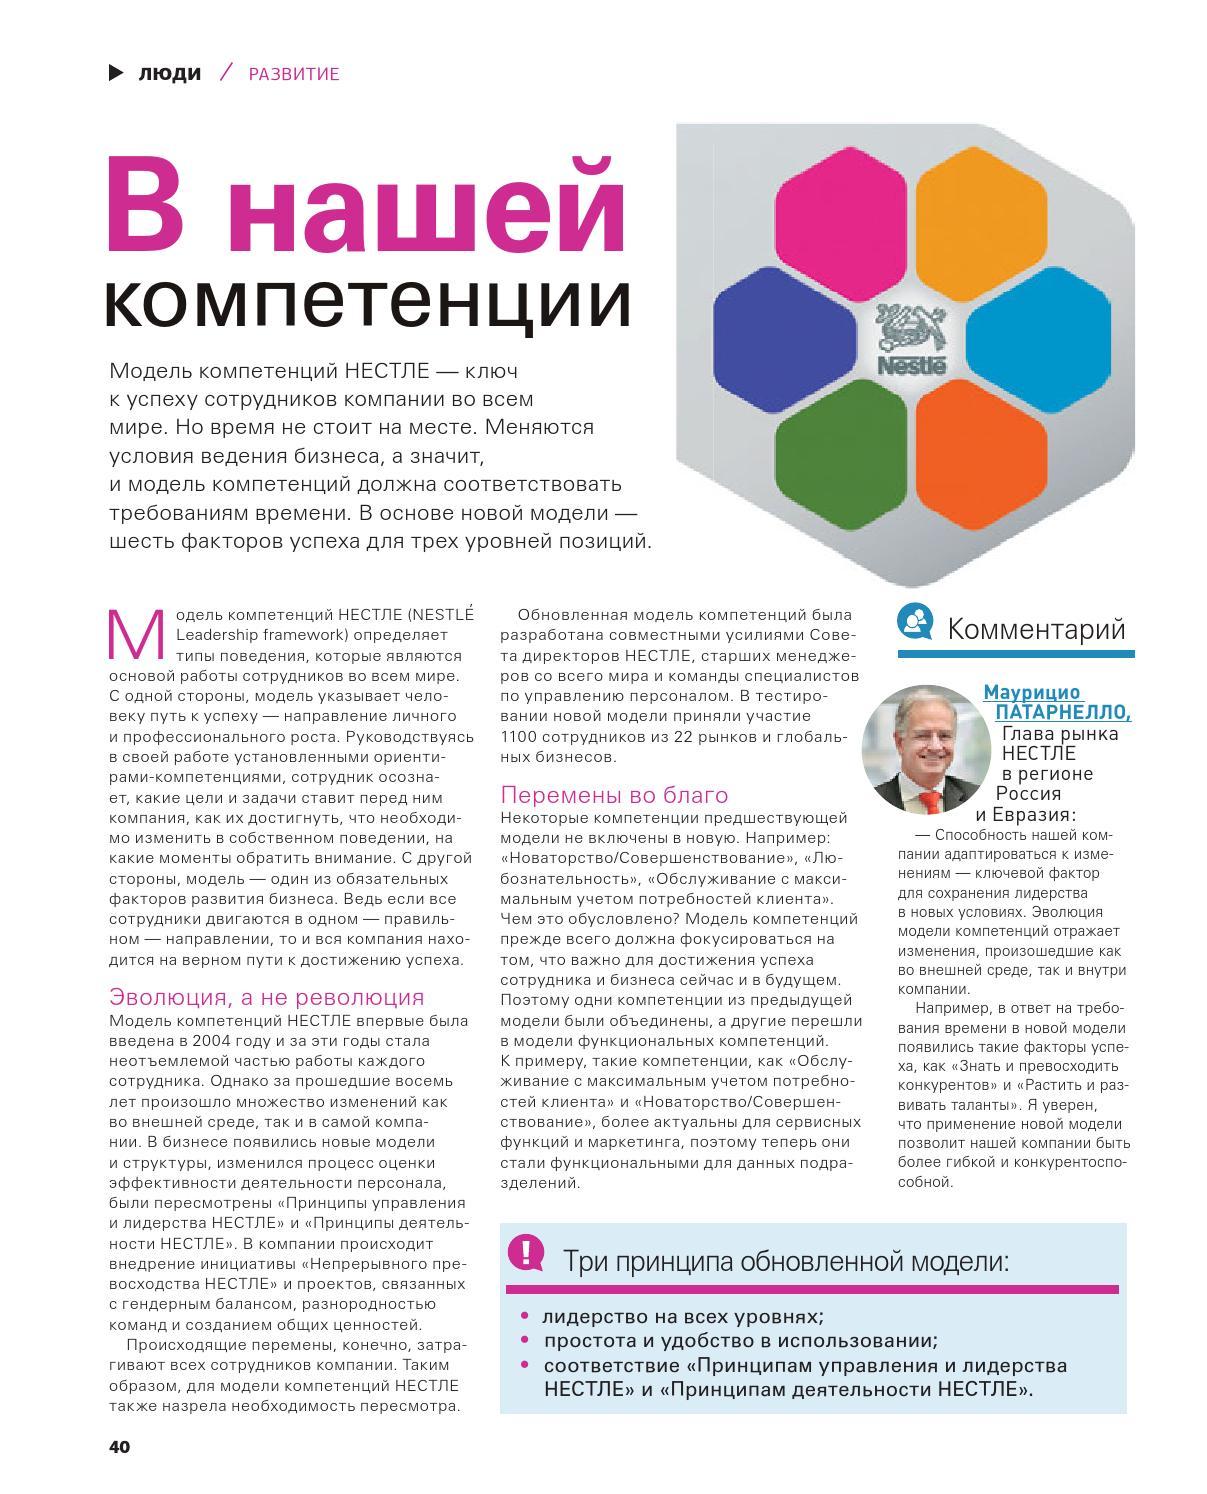 nestle functional strategies Nestle%s effectiveness of digital and social media marketing strategies and and functional perspective analysis of nestle's social media strategy by key.